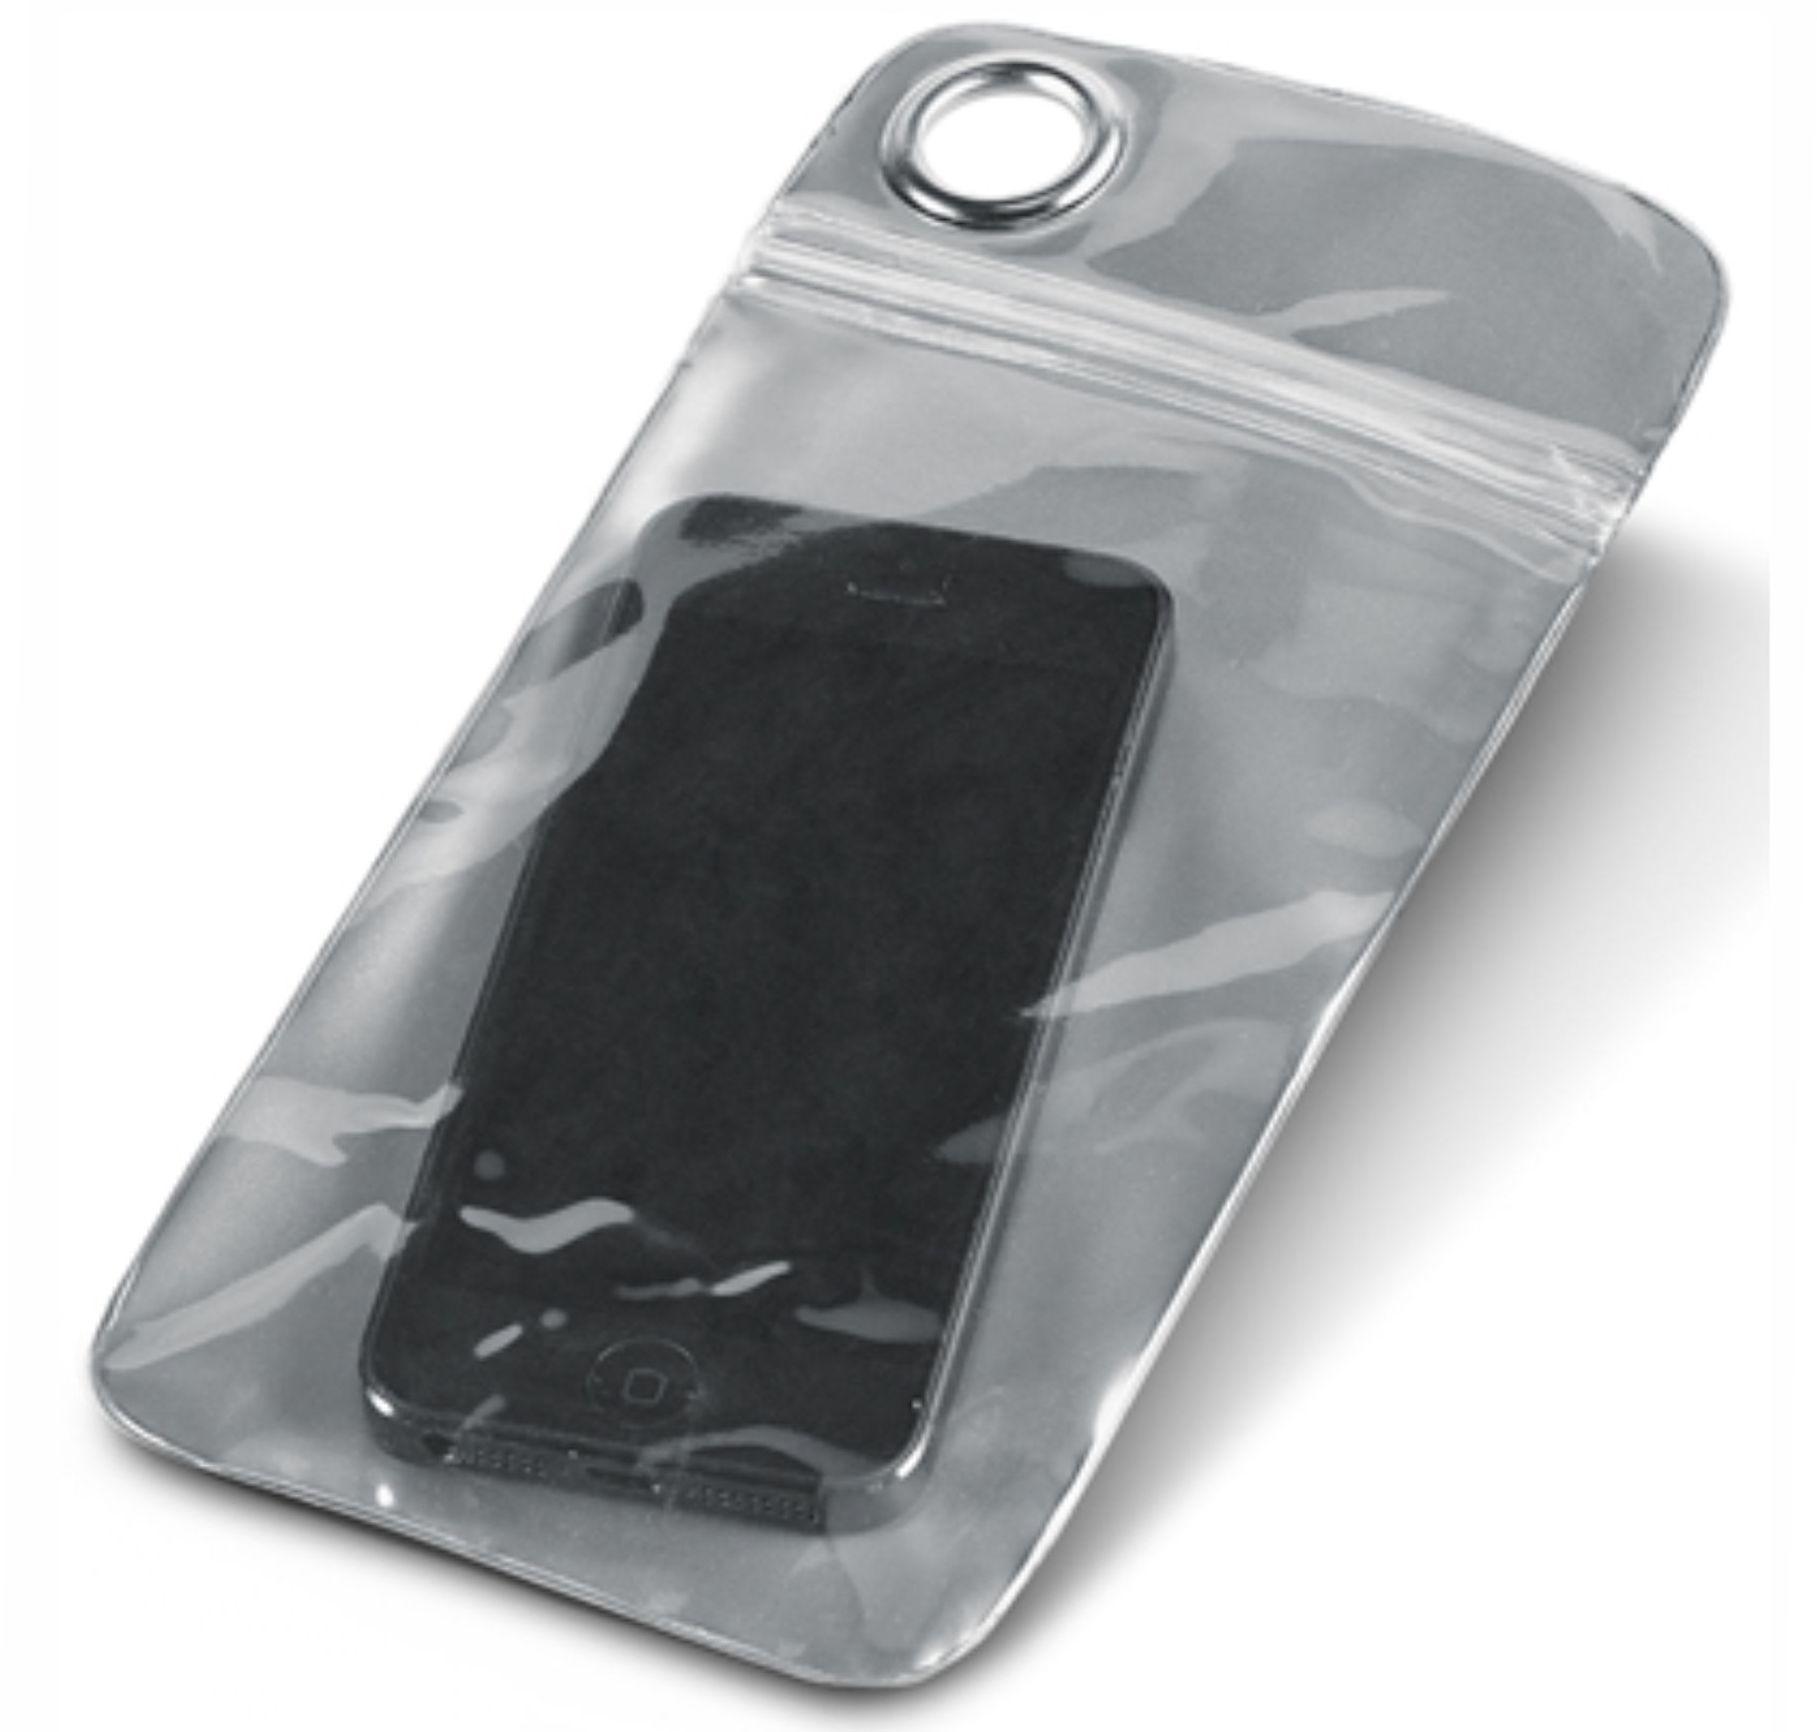 BC315SP – Capinha para celular – Para brindes